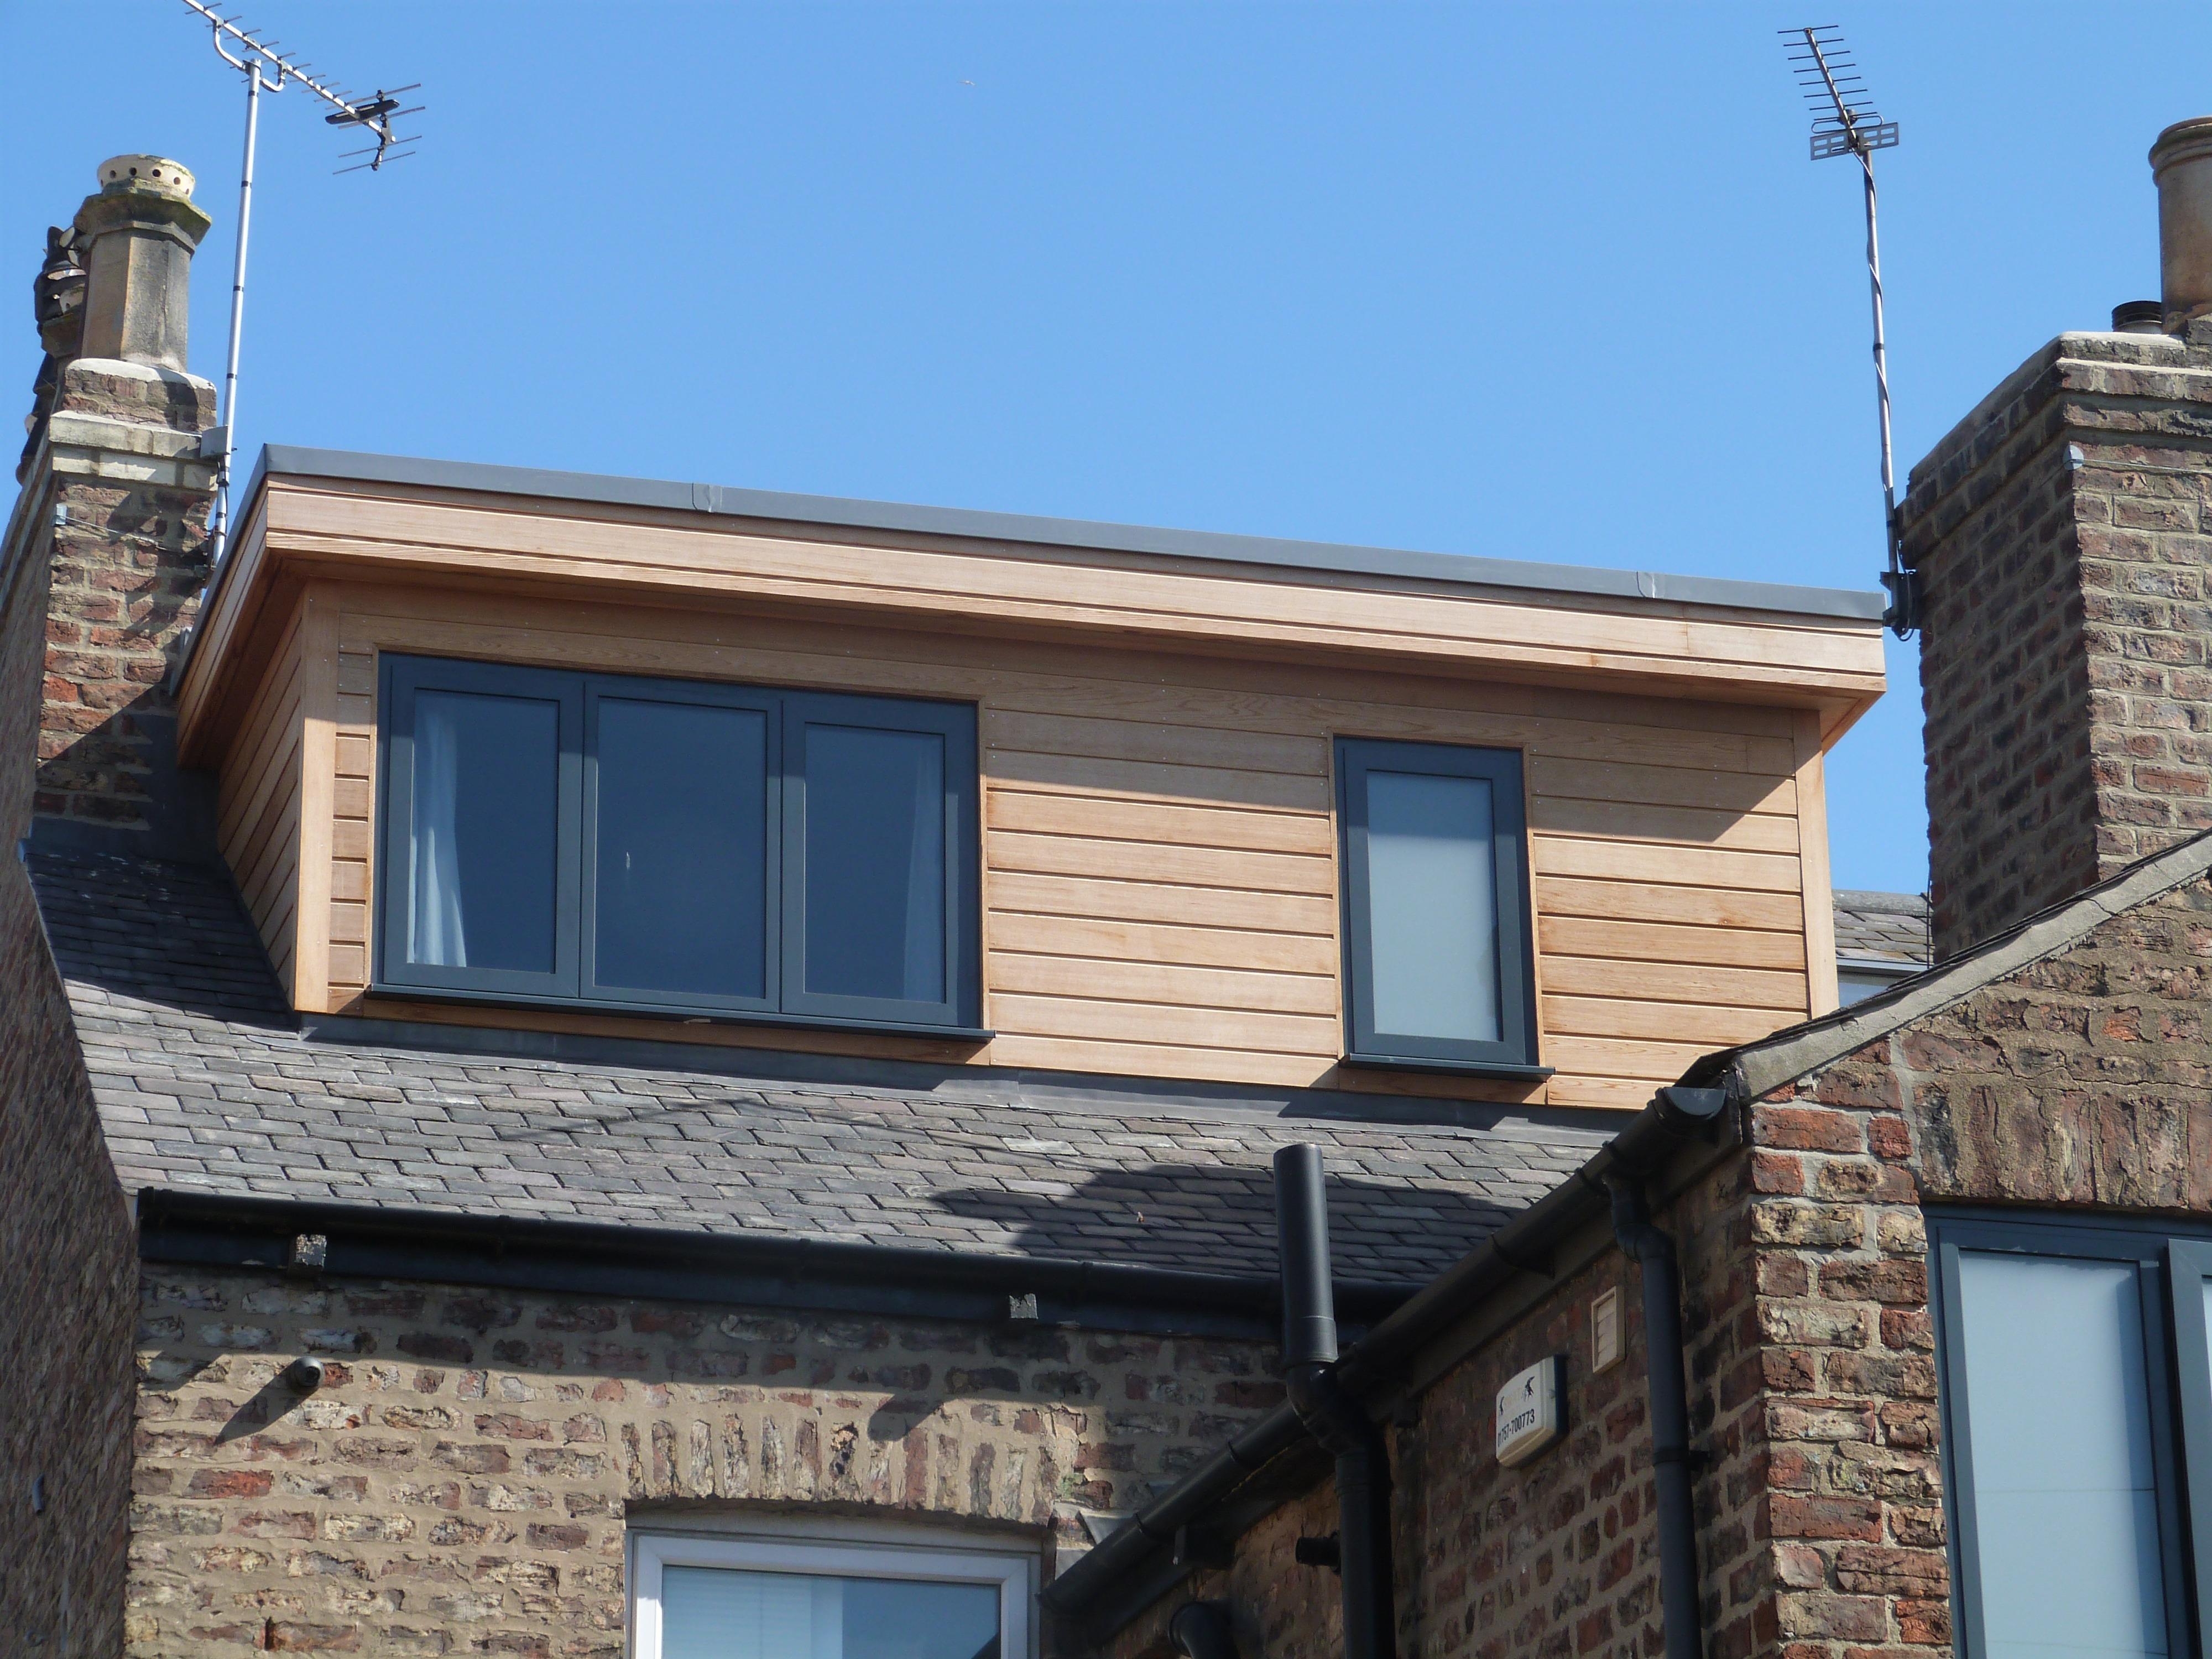 Belway Street York Dormer Replacement - GNR Roofing York